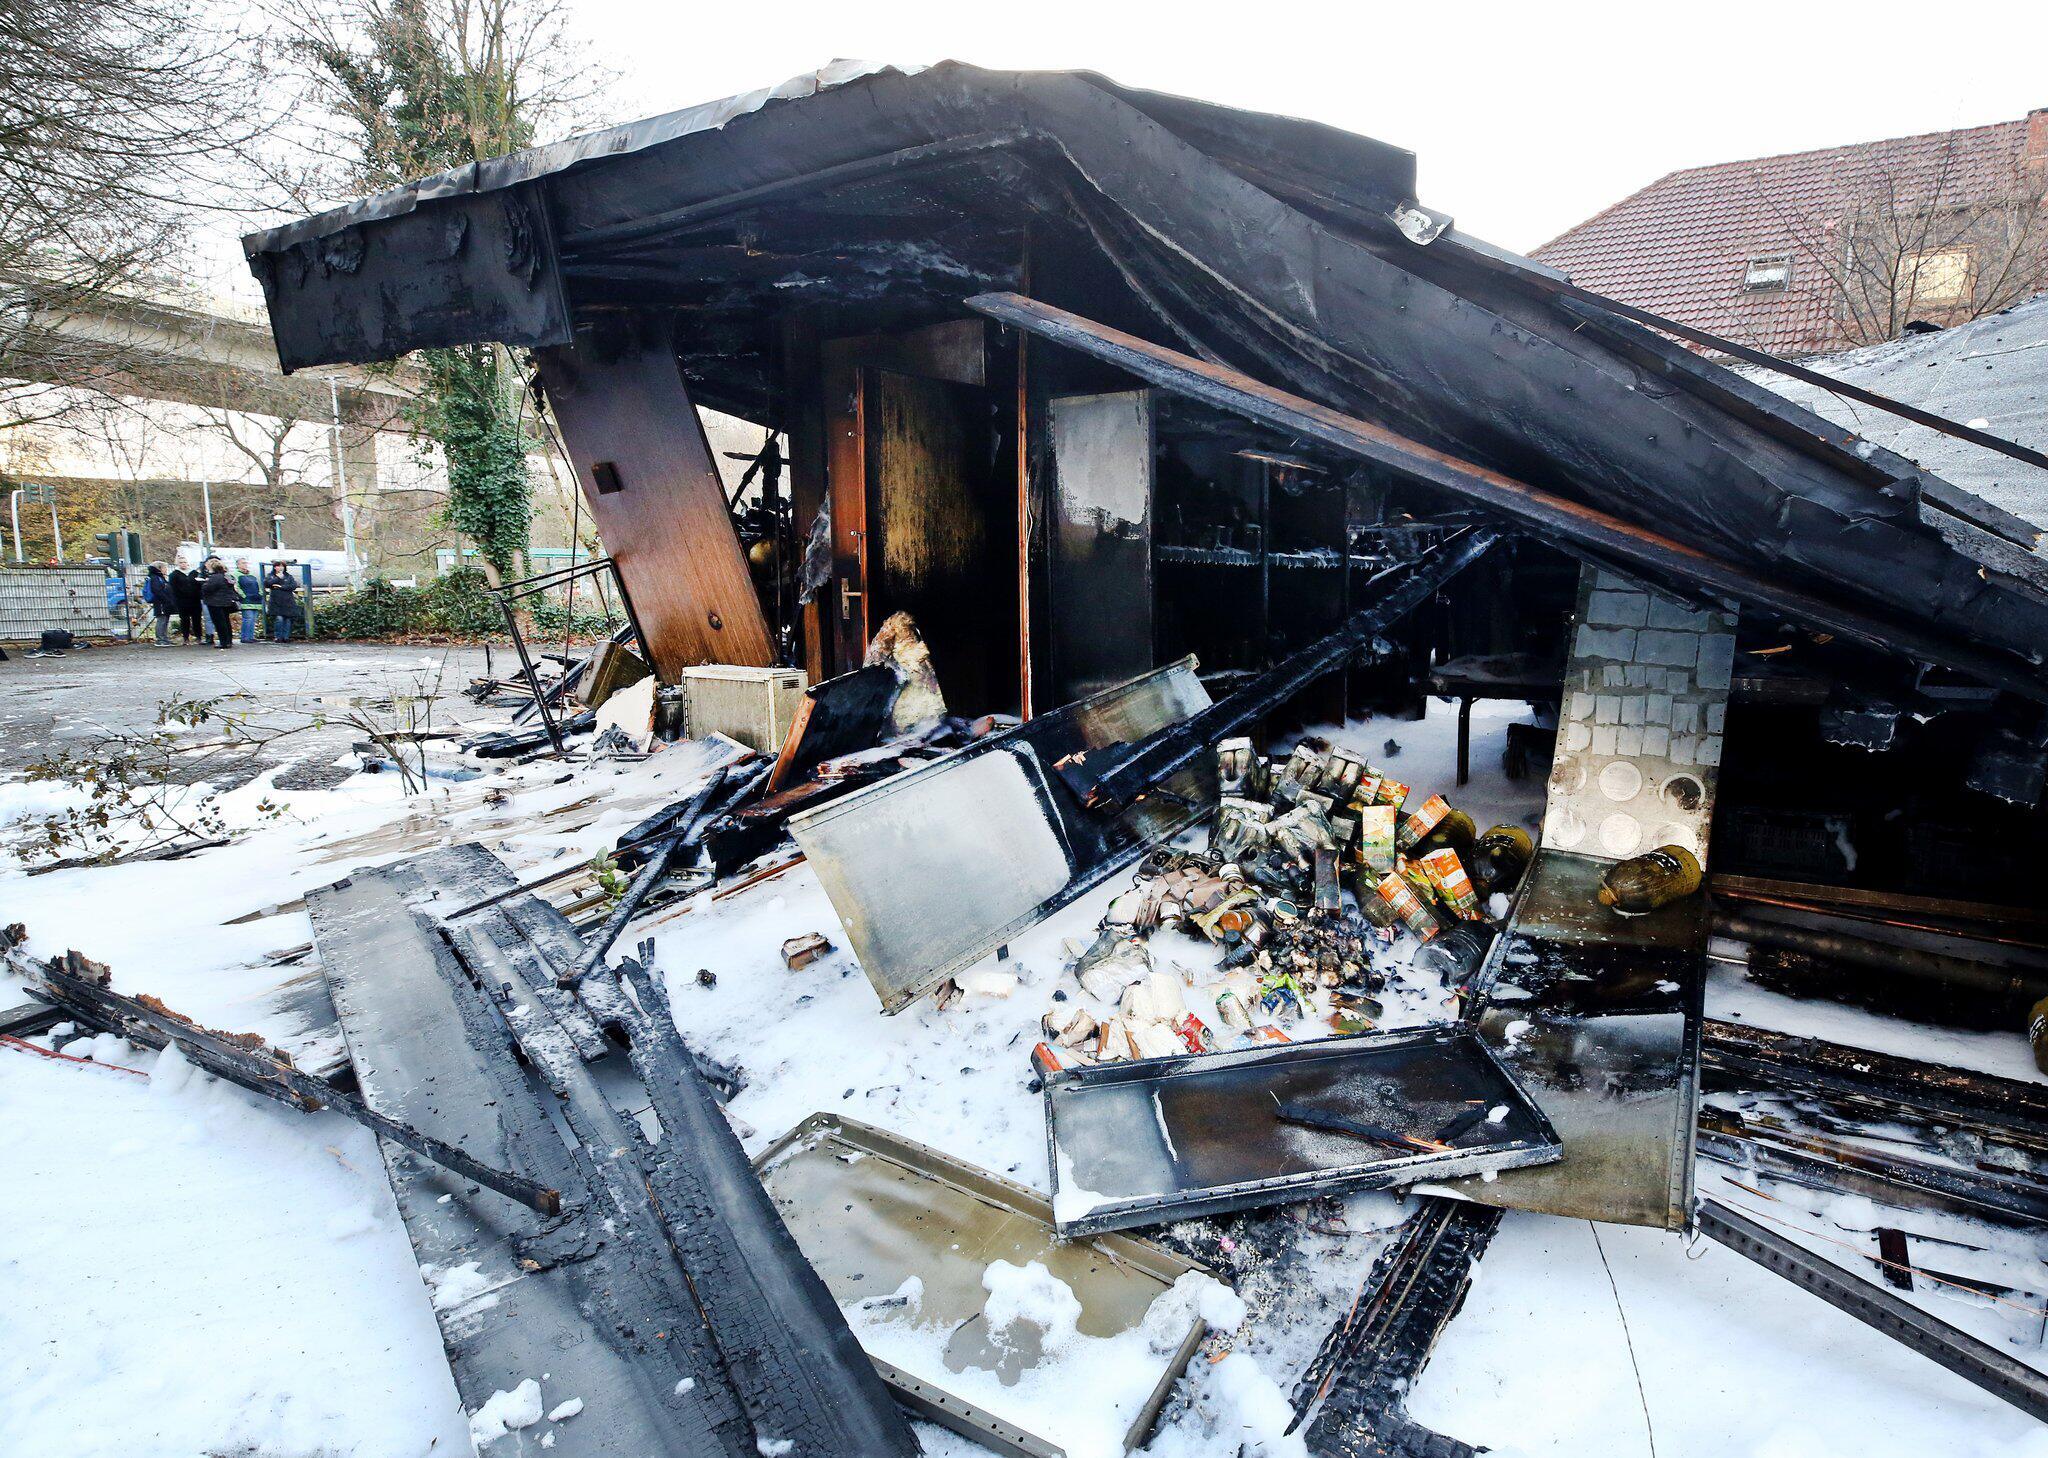 Bild zu Feuer zerstört Essensausgabe der Duisburger Tafel